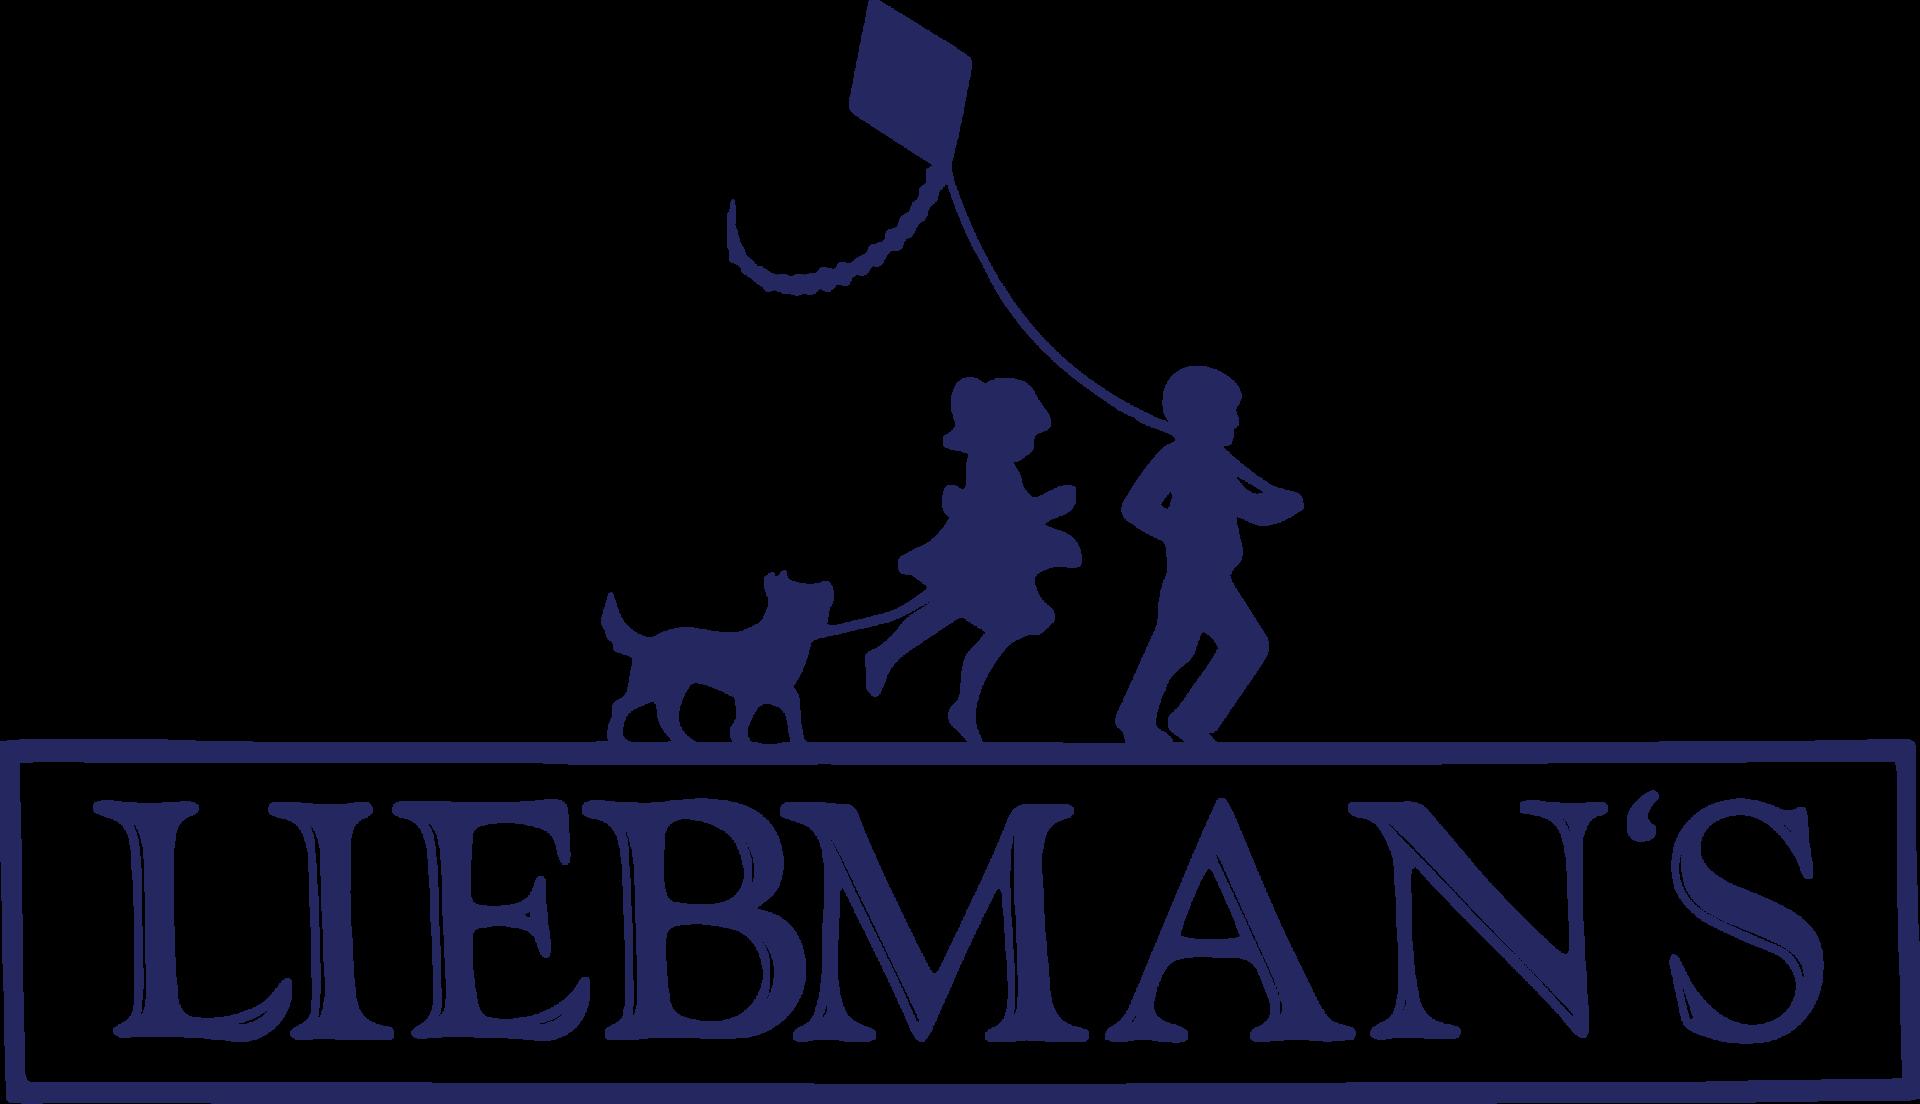 Liebmans Logo Main.png